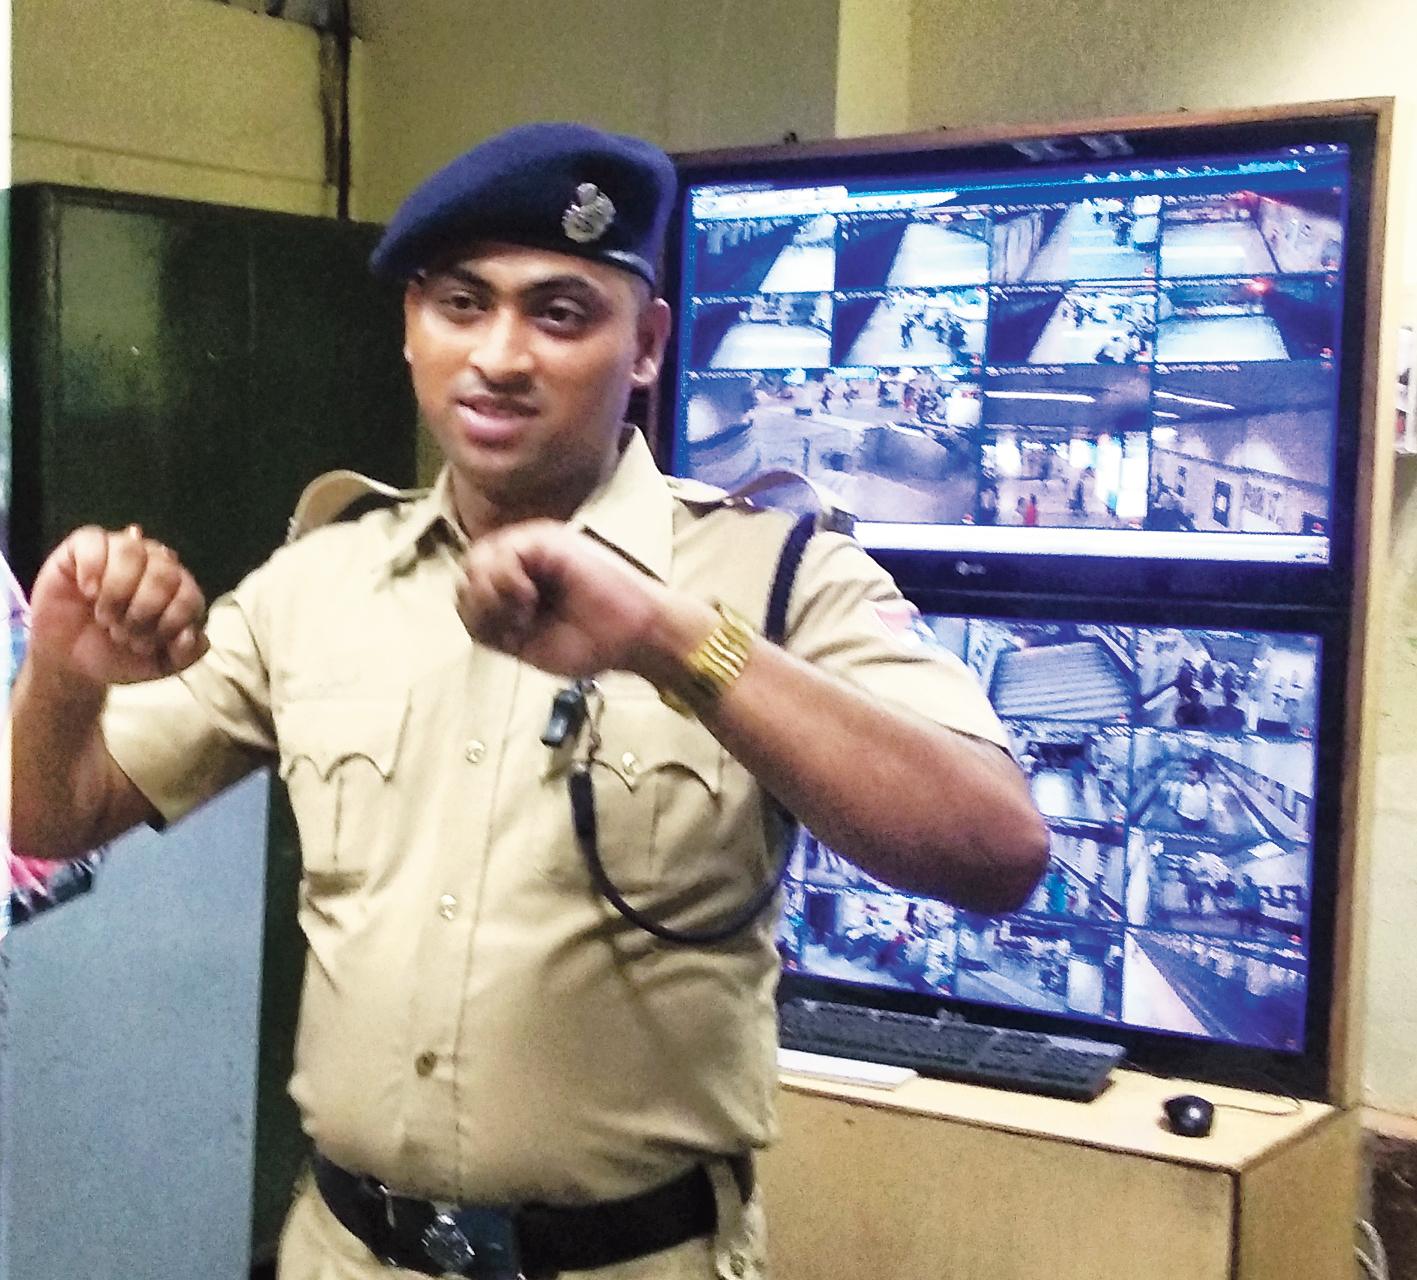 RPF jawan Bidyut Das demonstrates how the passenger tried to prise open the door of the Metro train.